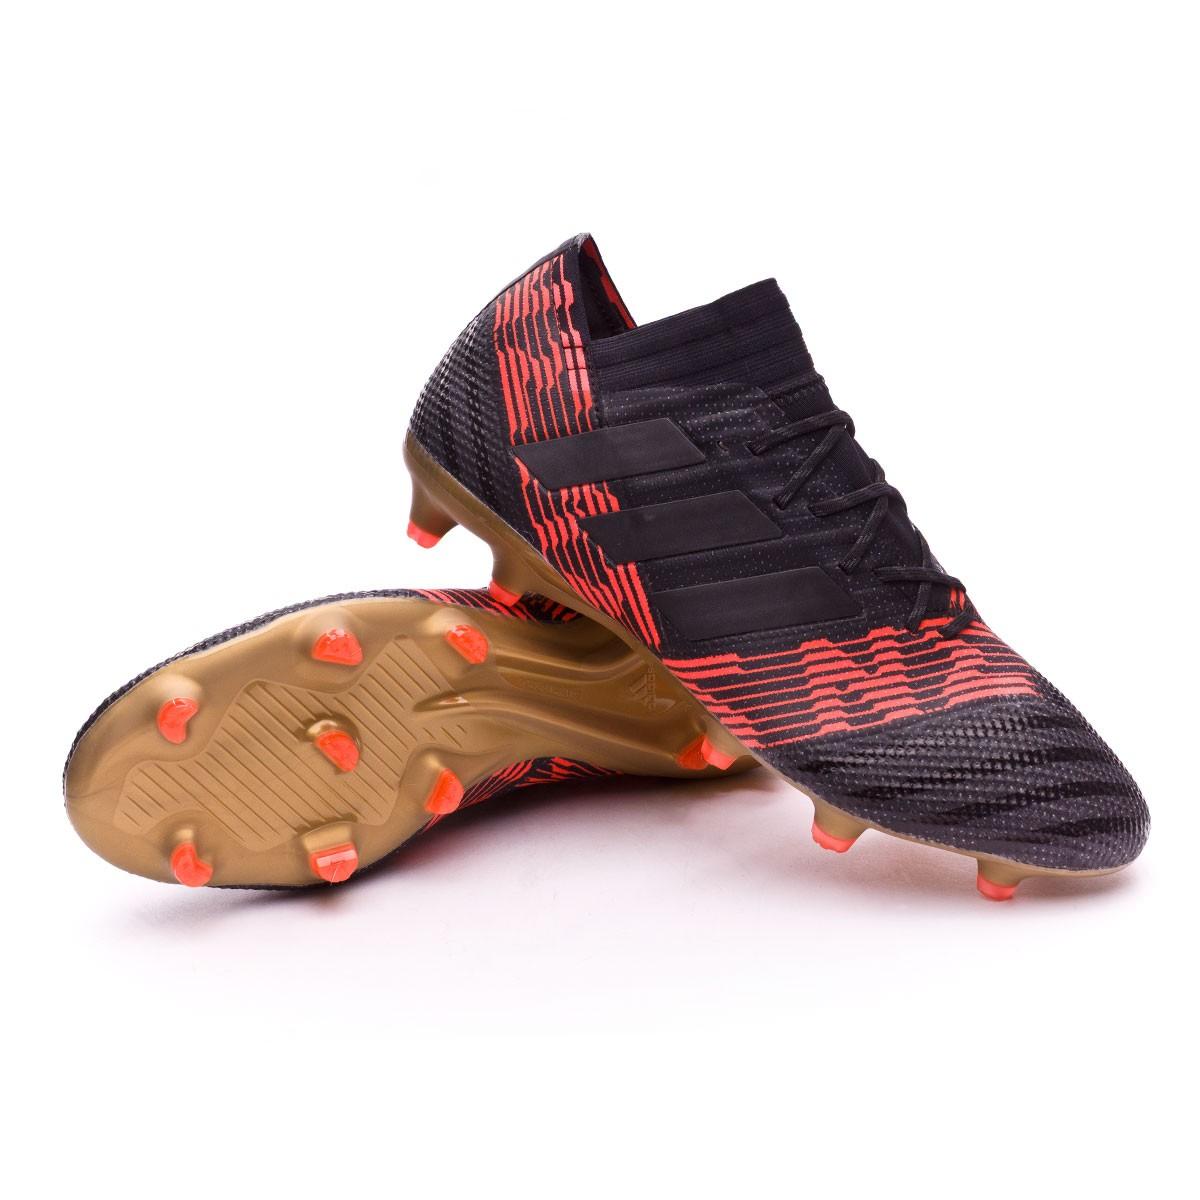 52b5b8ead Football Boots adidas Nemeziz 17.1 FG Core black-Solar red ...